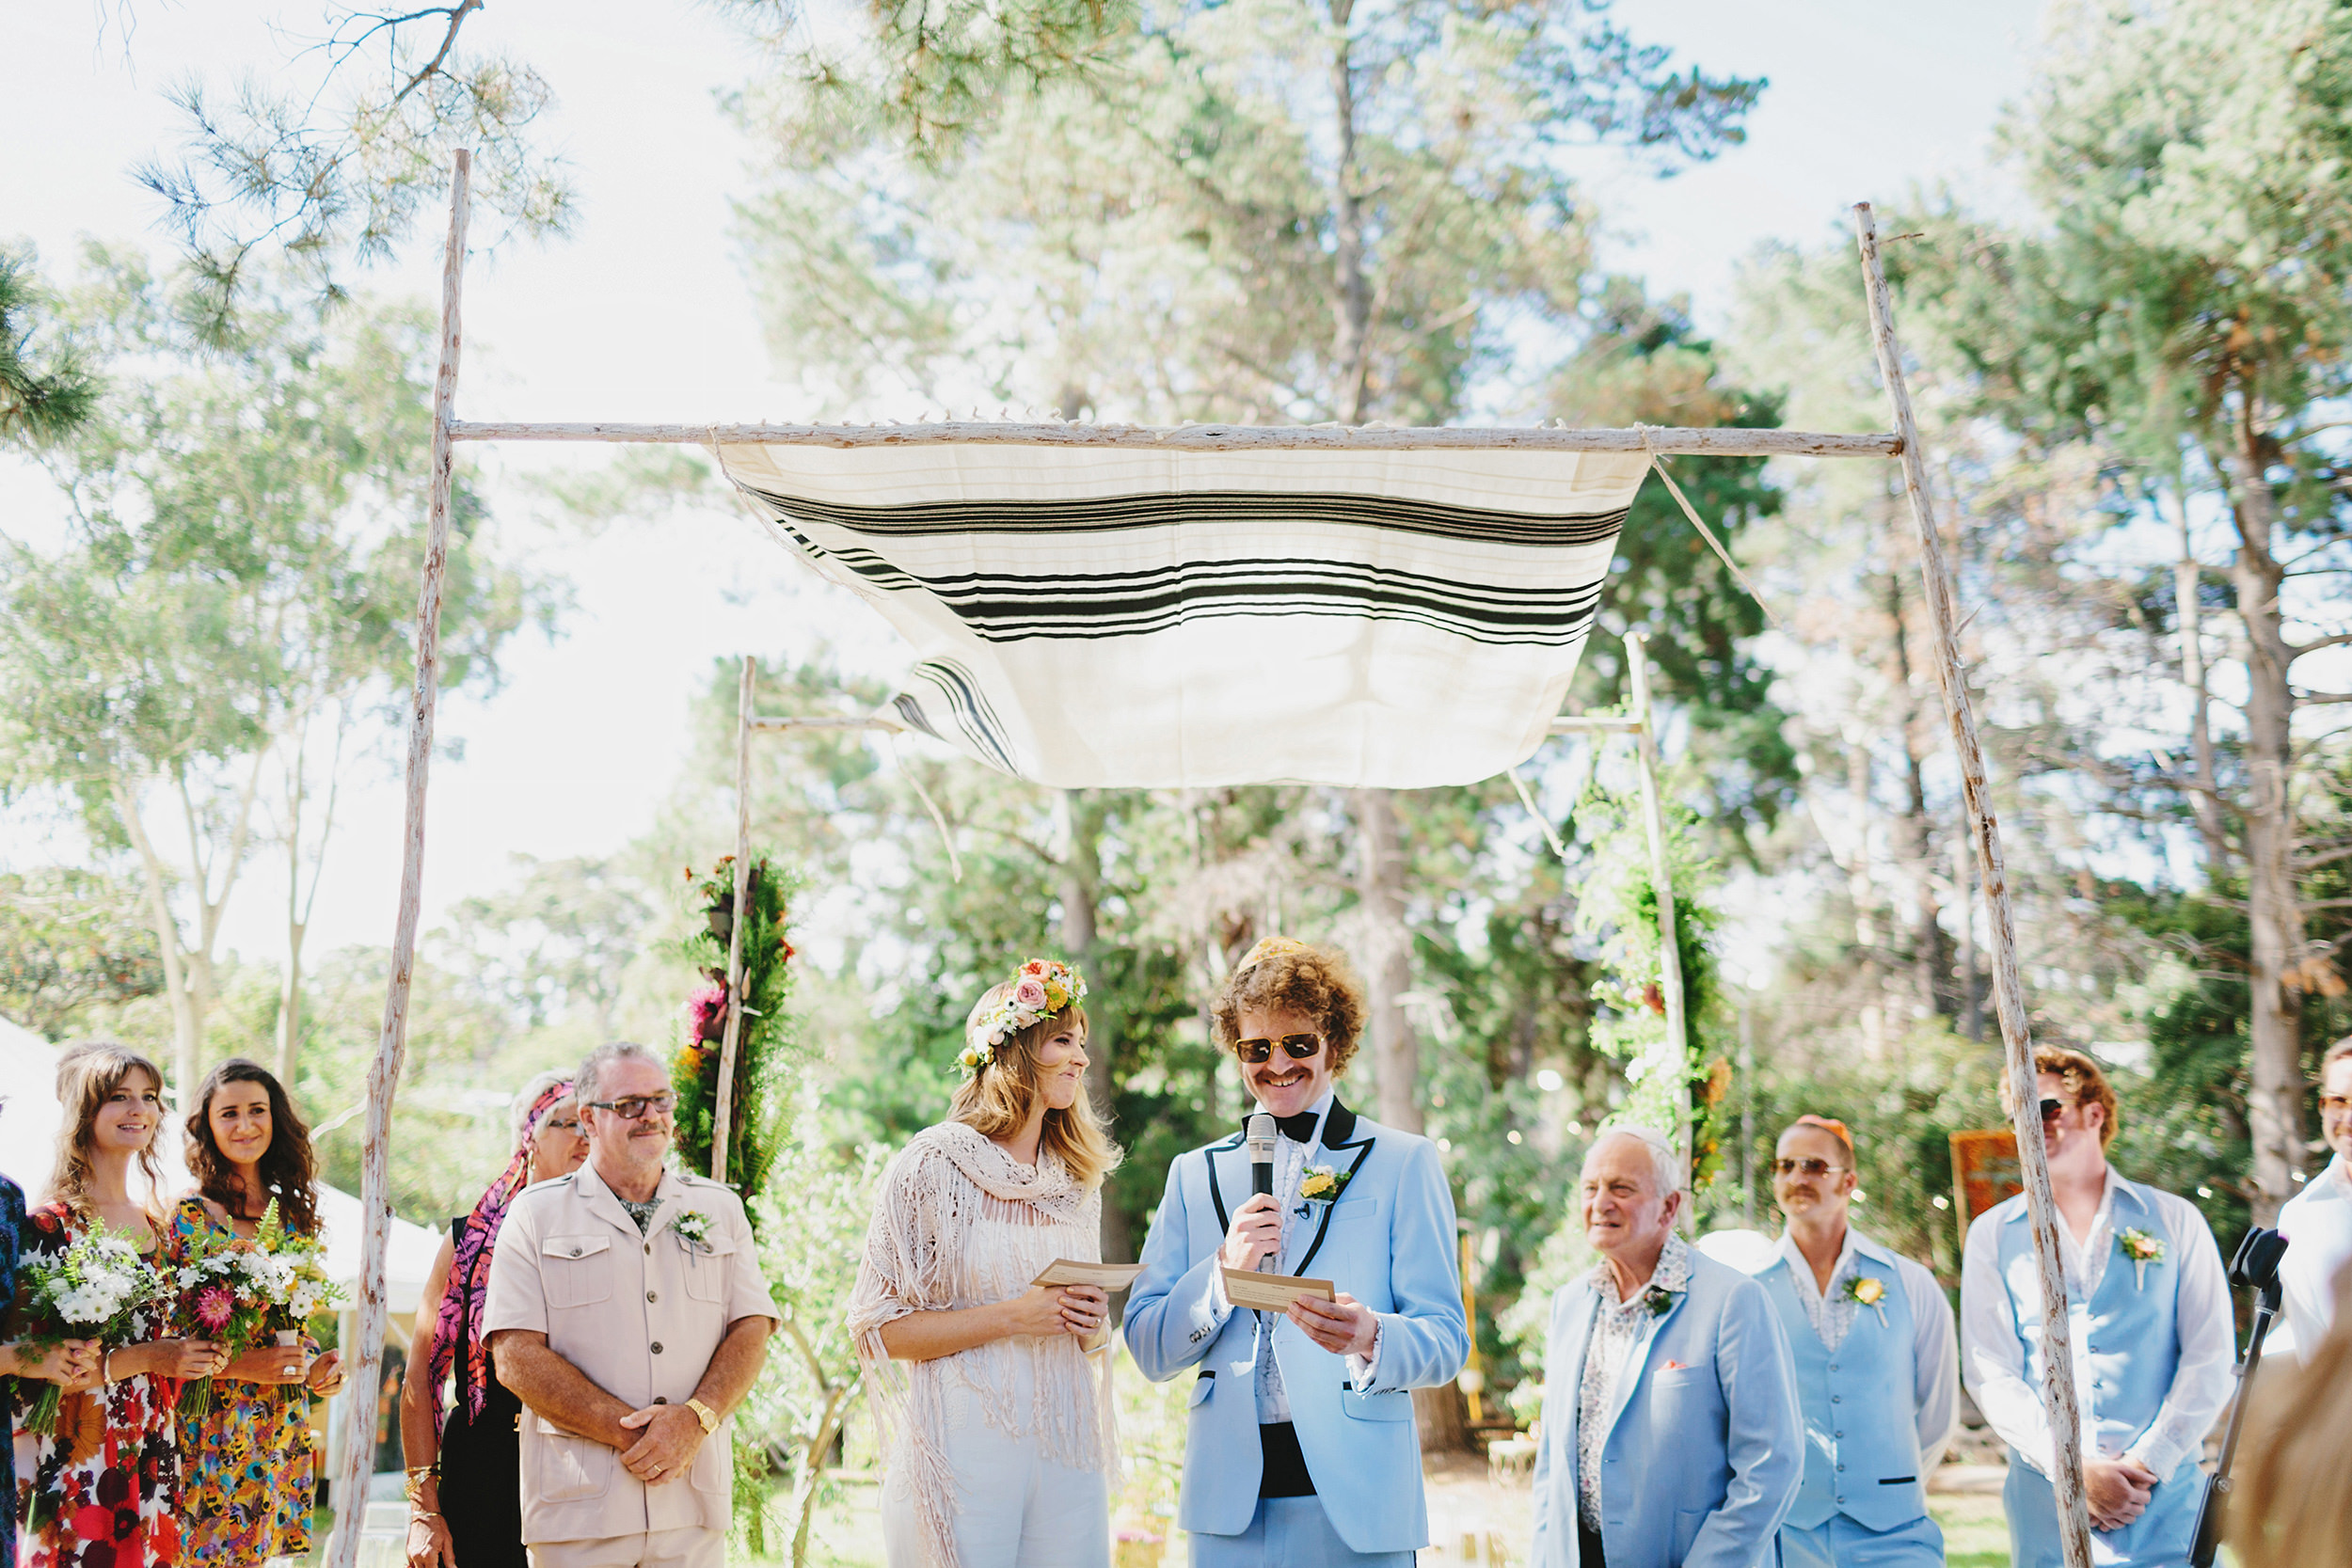 Melbourne_Vintage_Backyard_Wedding_Ben_Erin 024.JPG